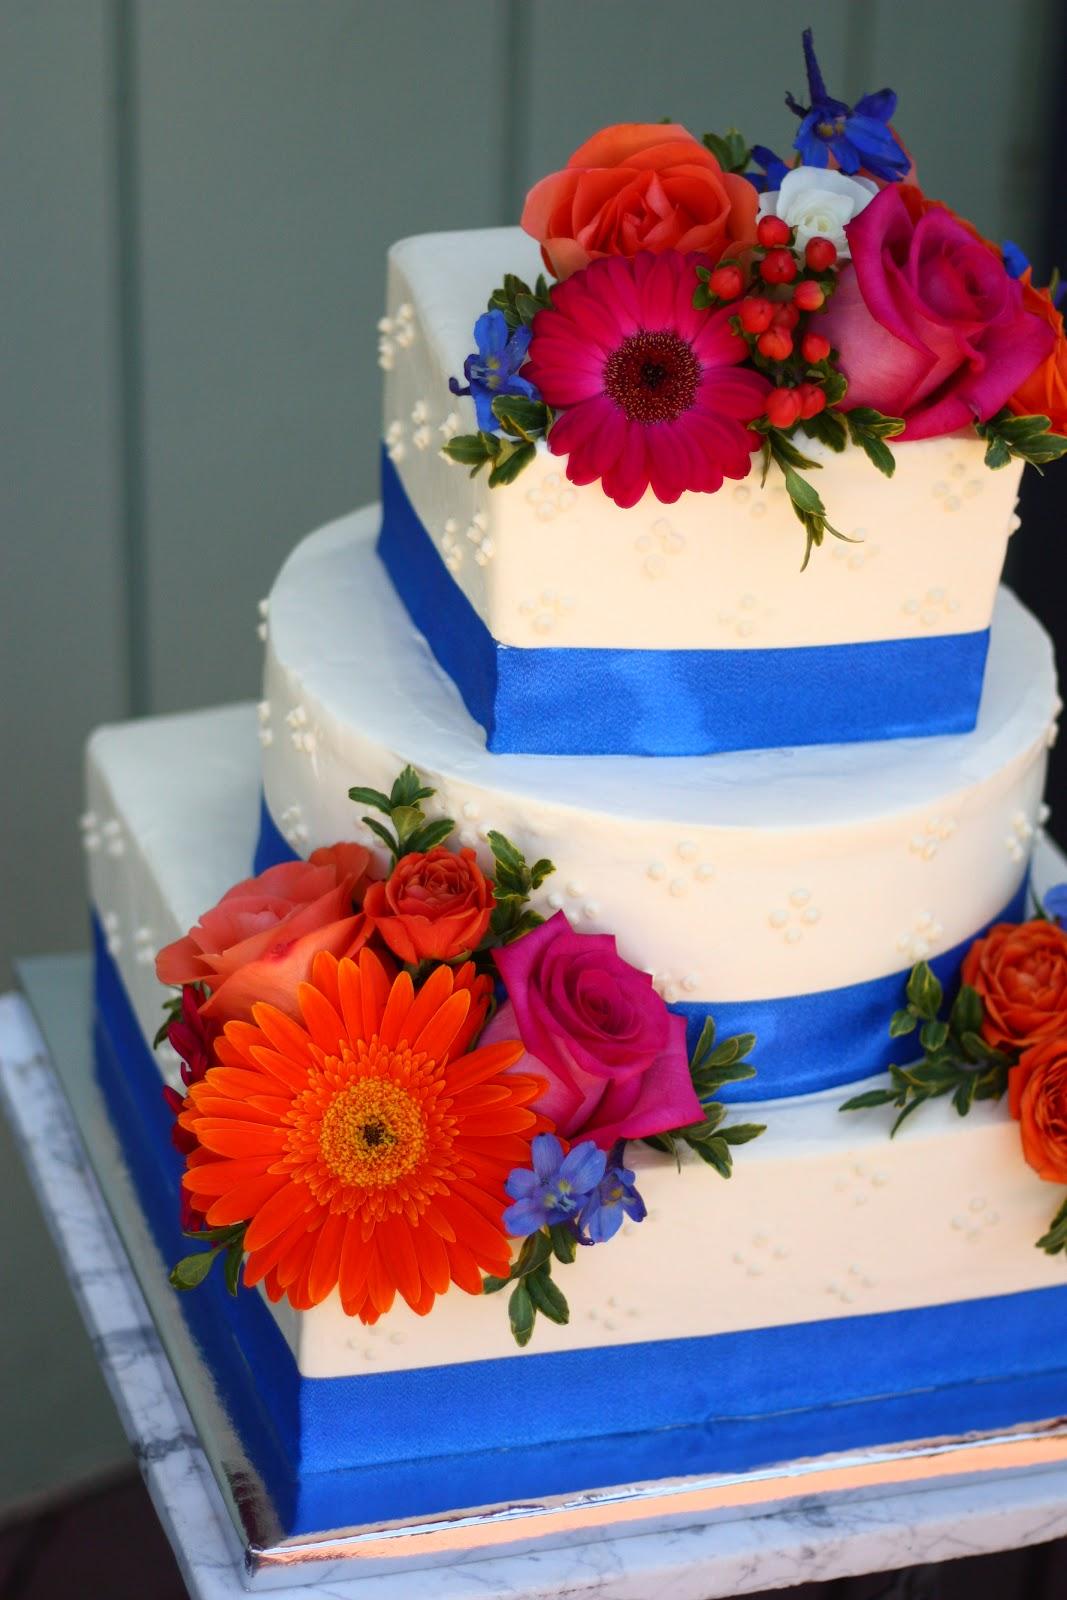 Pie In The Sky Wedding Cake Roundup